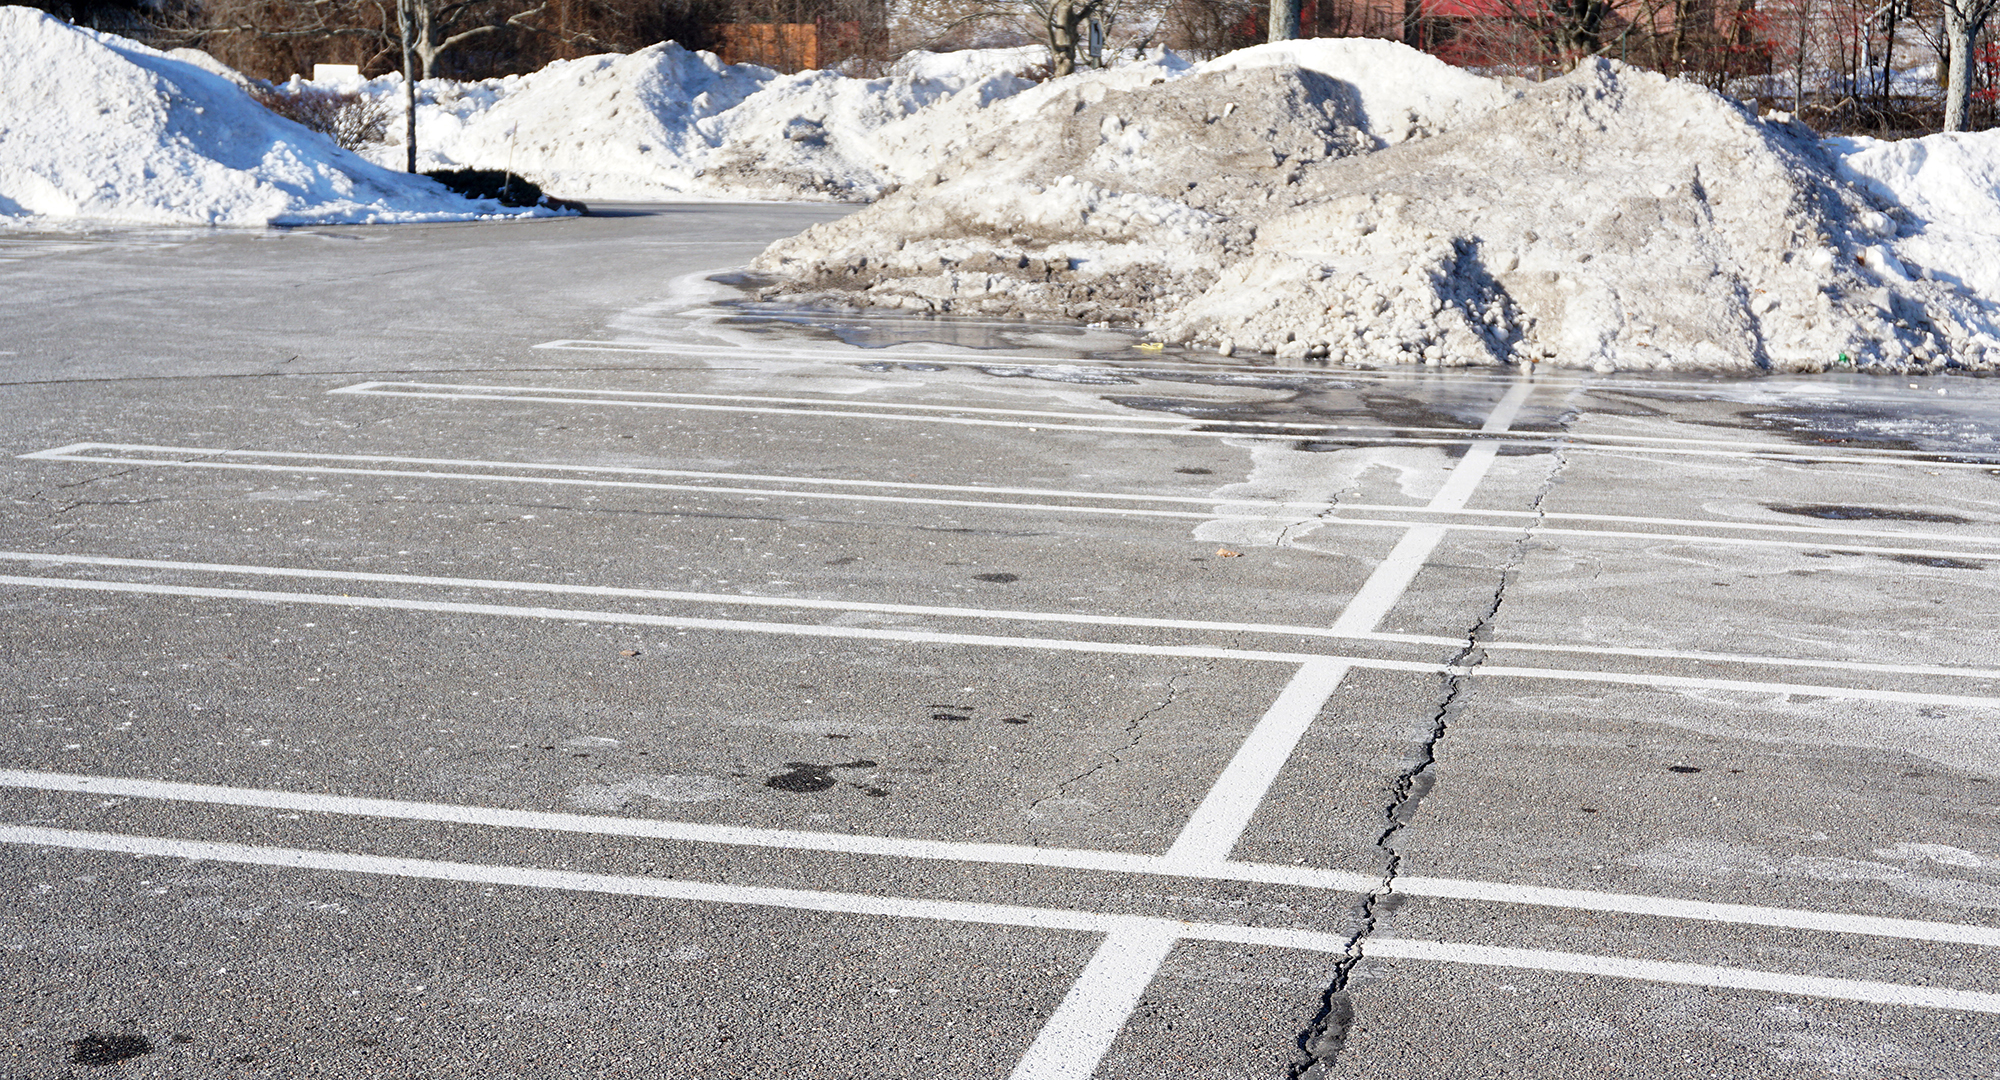 parking lot damage after winter